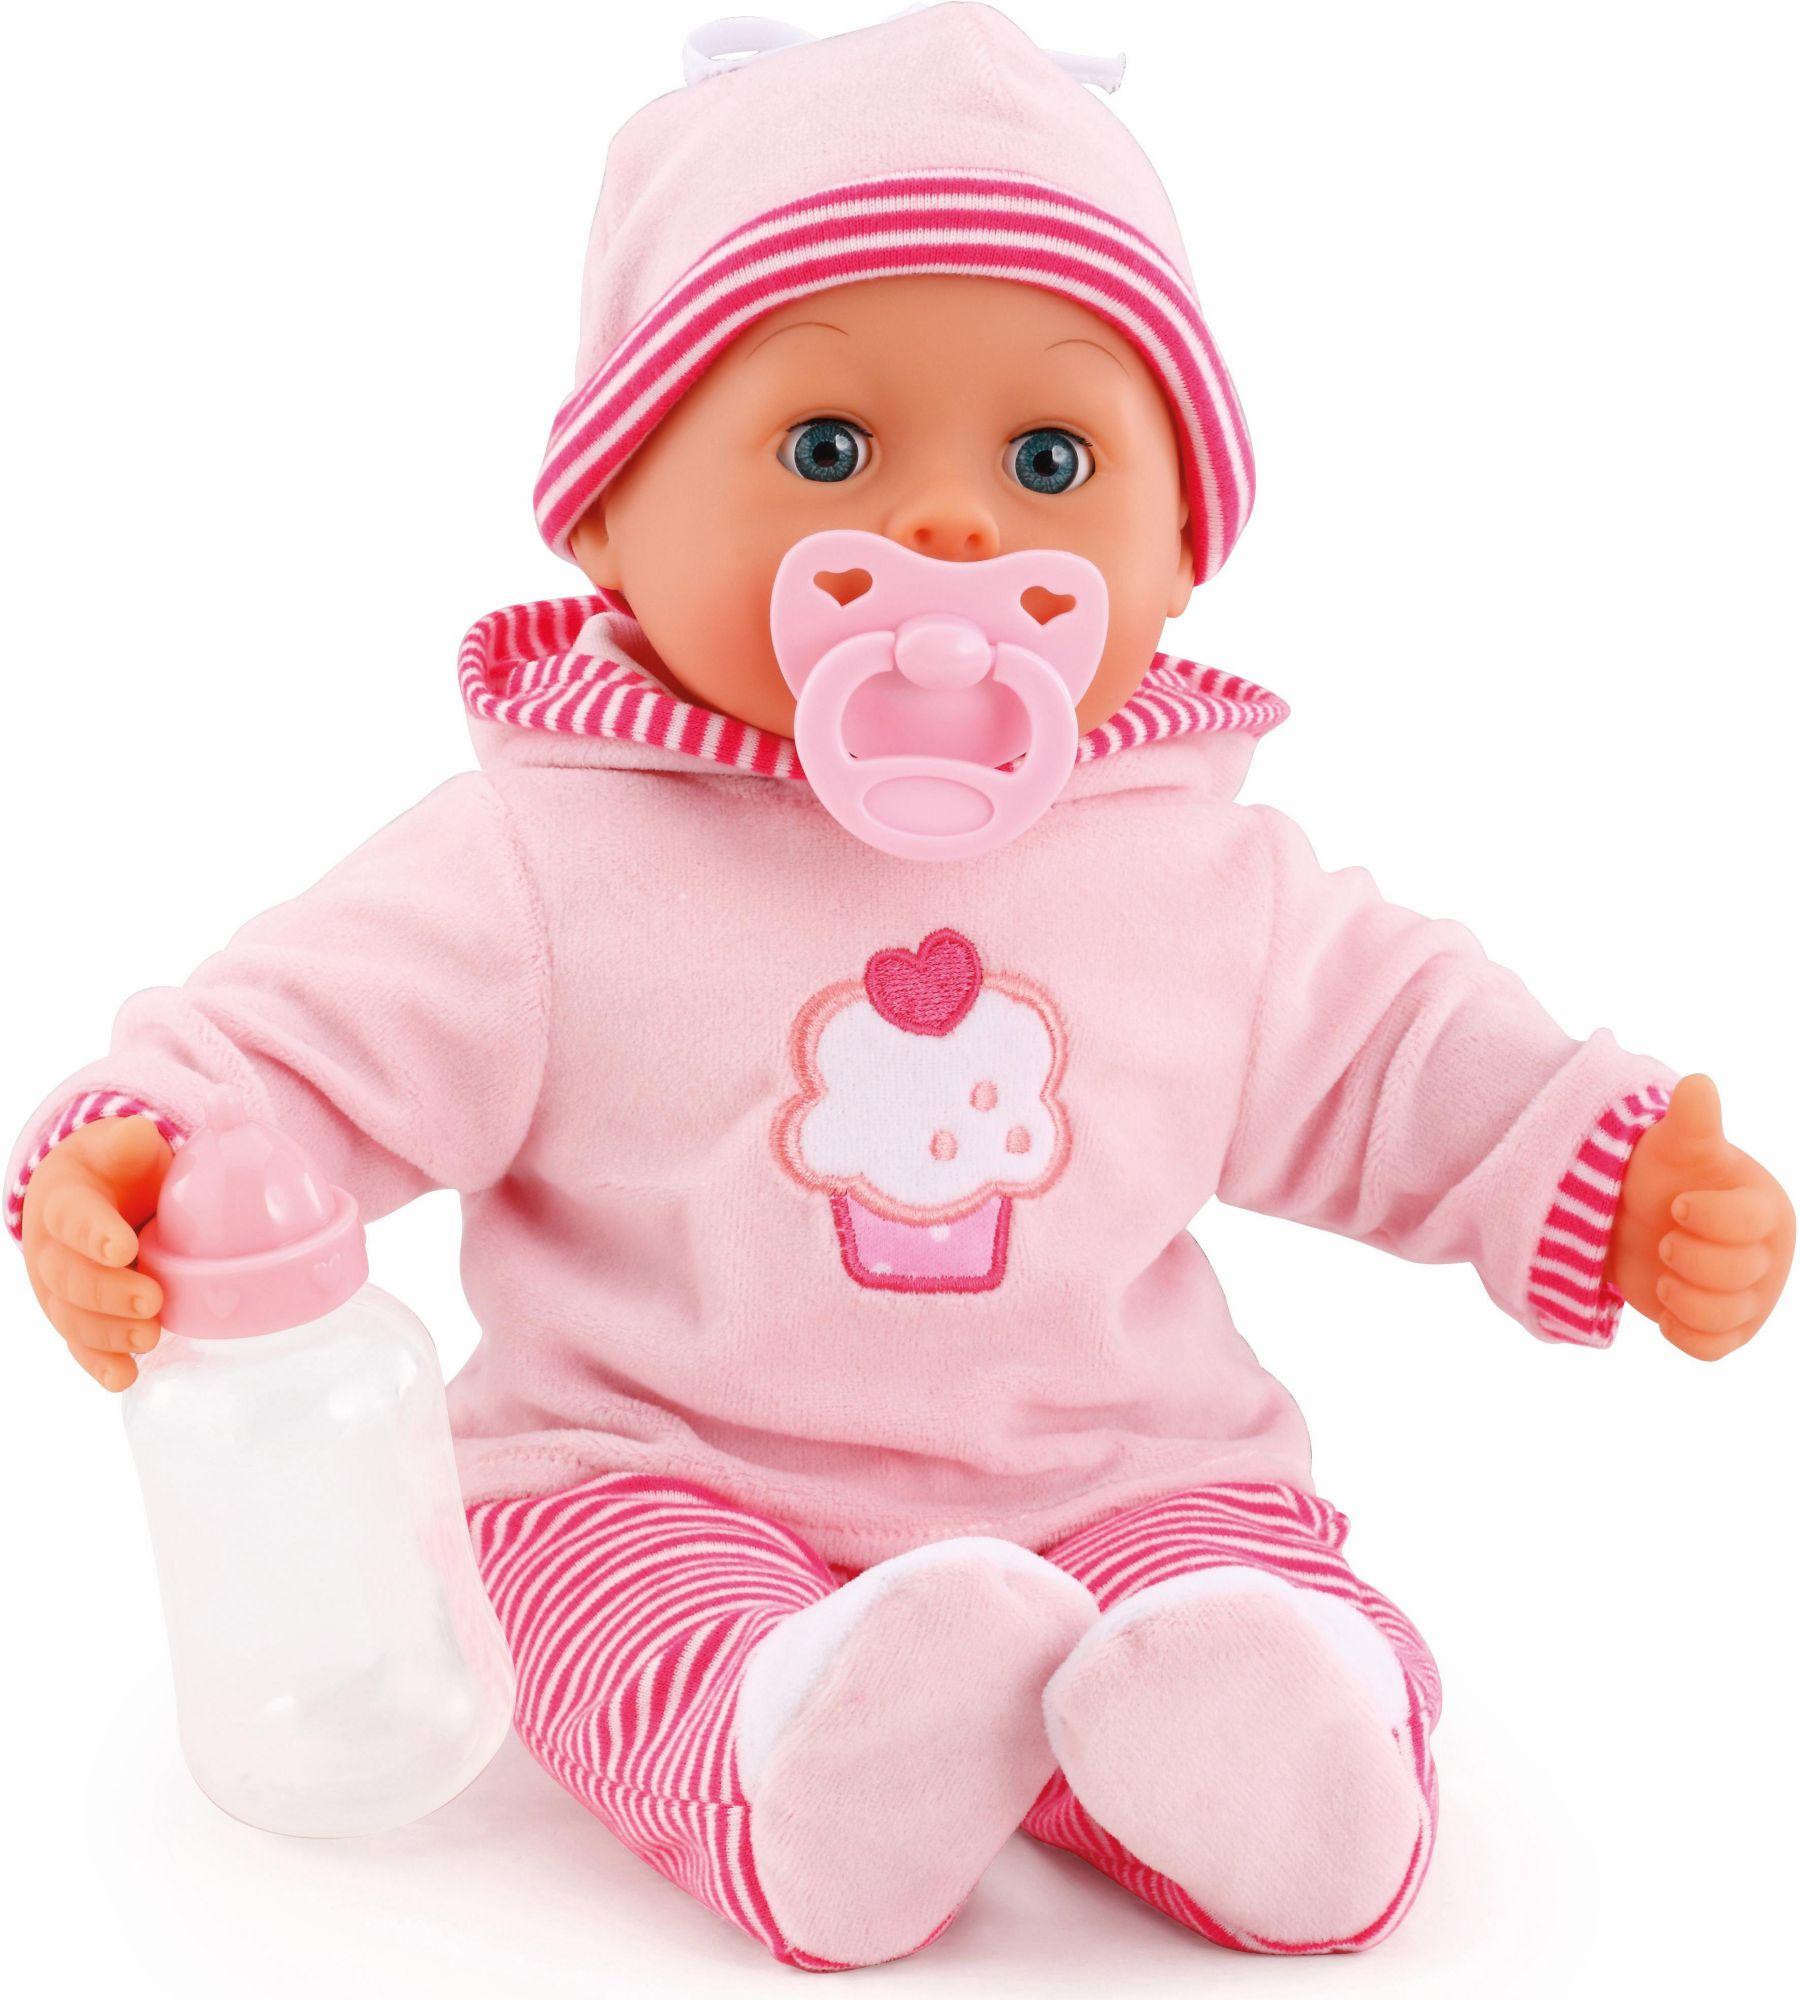 BAYER Bayer Design Babypuppe mit Funktion, »First Words Baby, pink 38 cm«